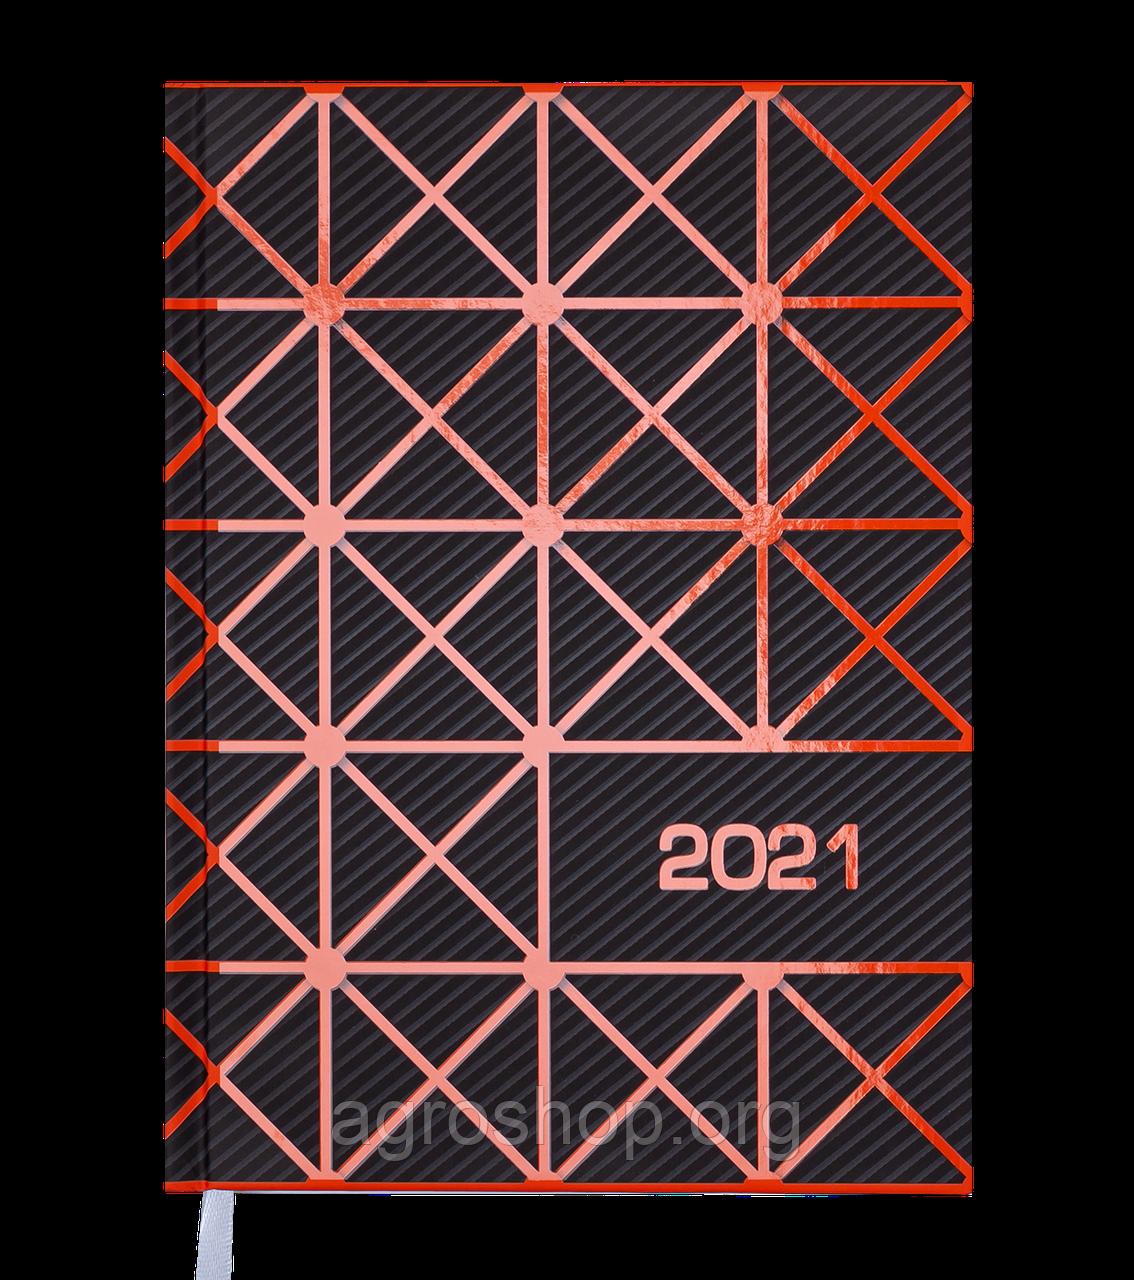 Щоденник датов. 2021 LINEA, А5, помаранчевий